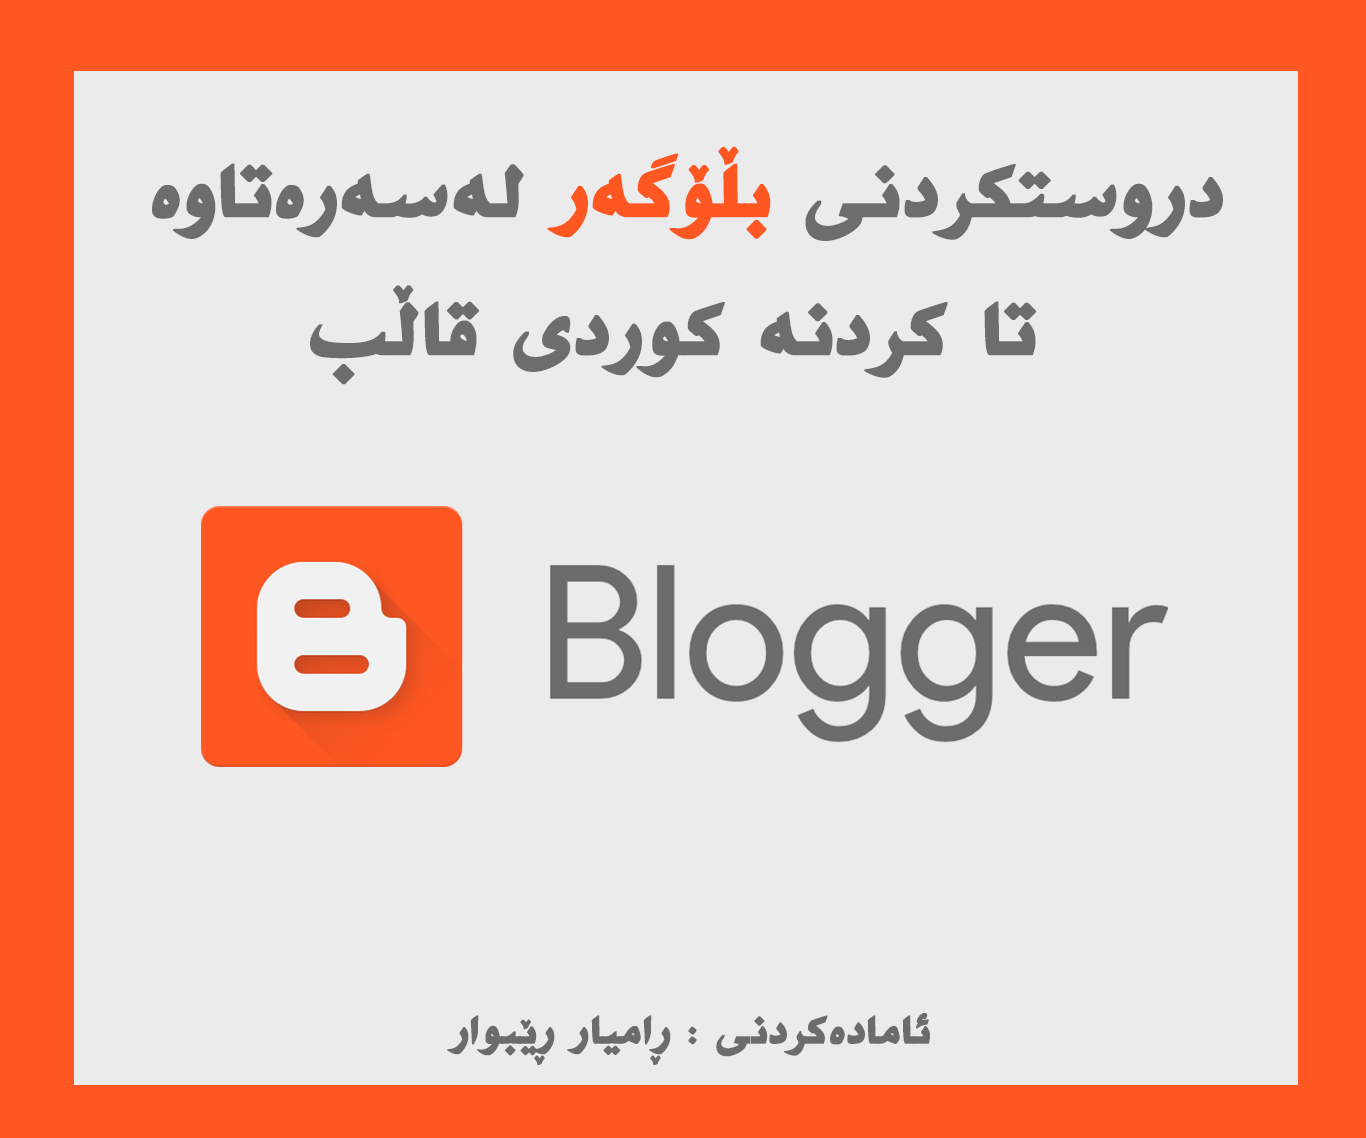 blogger-ramyar